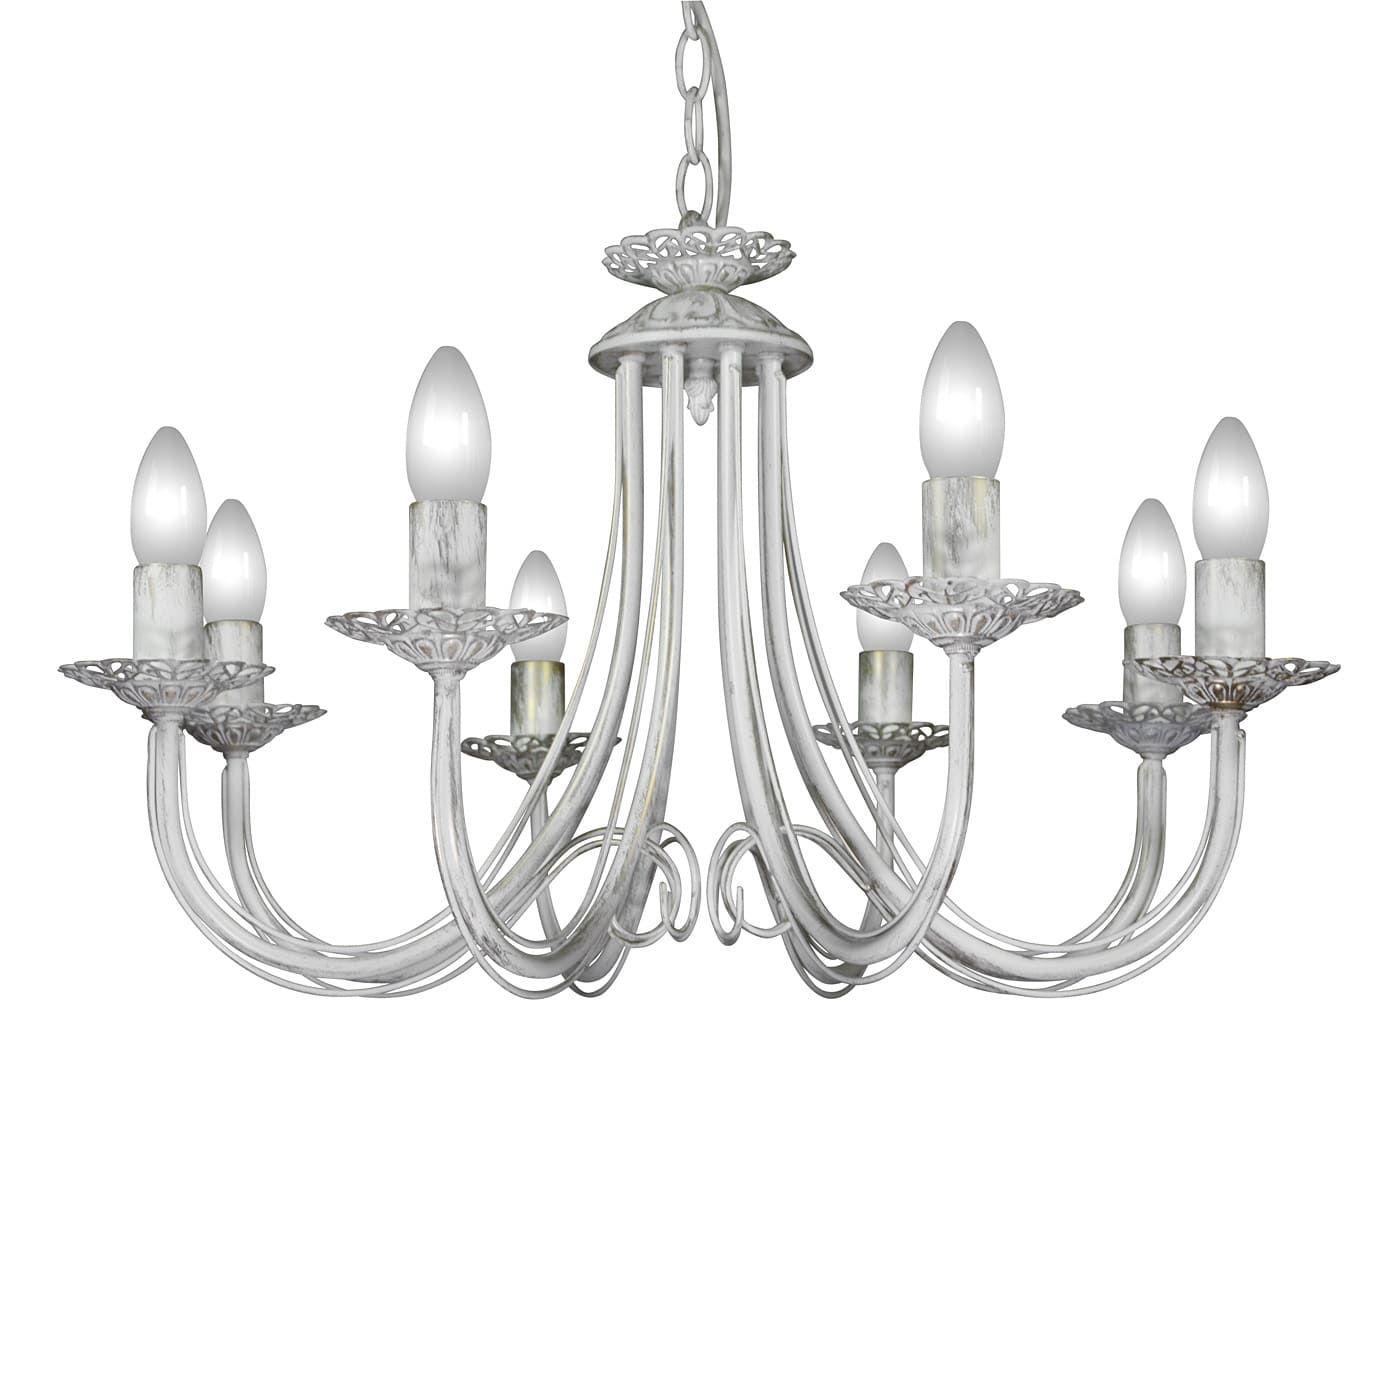 PETRASVET / Pendant chandelier S1165-8, 8xE14 max. 60W